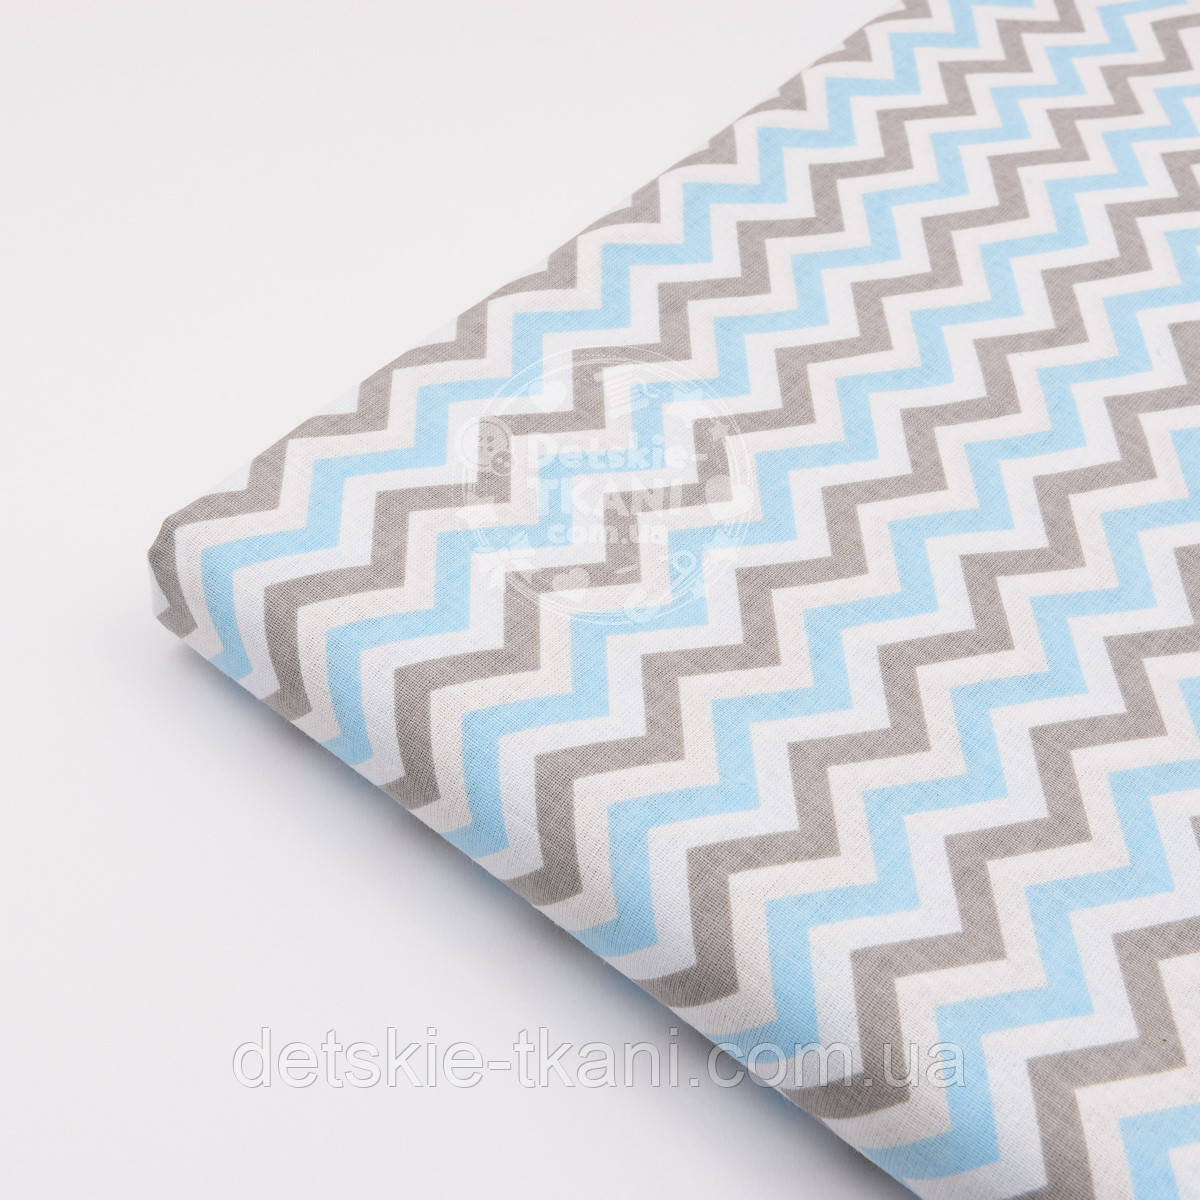 Лоскут ткани №1049  с густым зигзагом серо-голубого цвета, размер 58*83 см